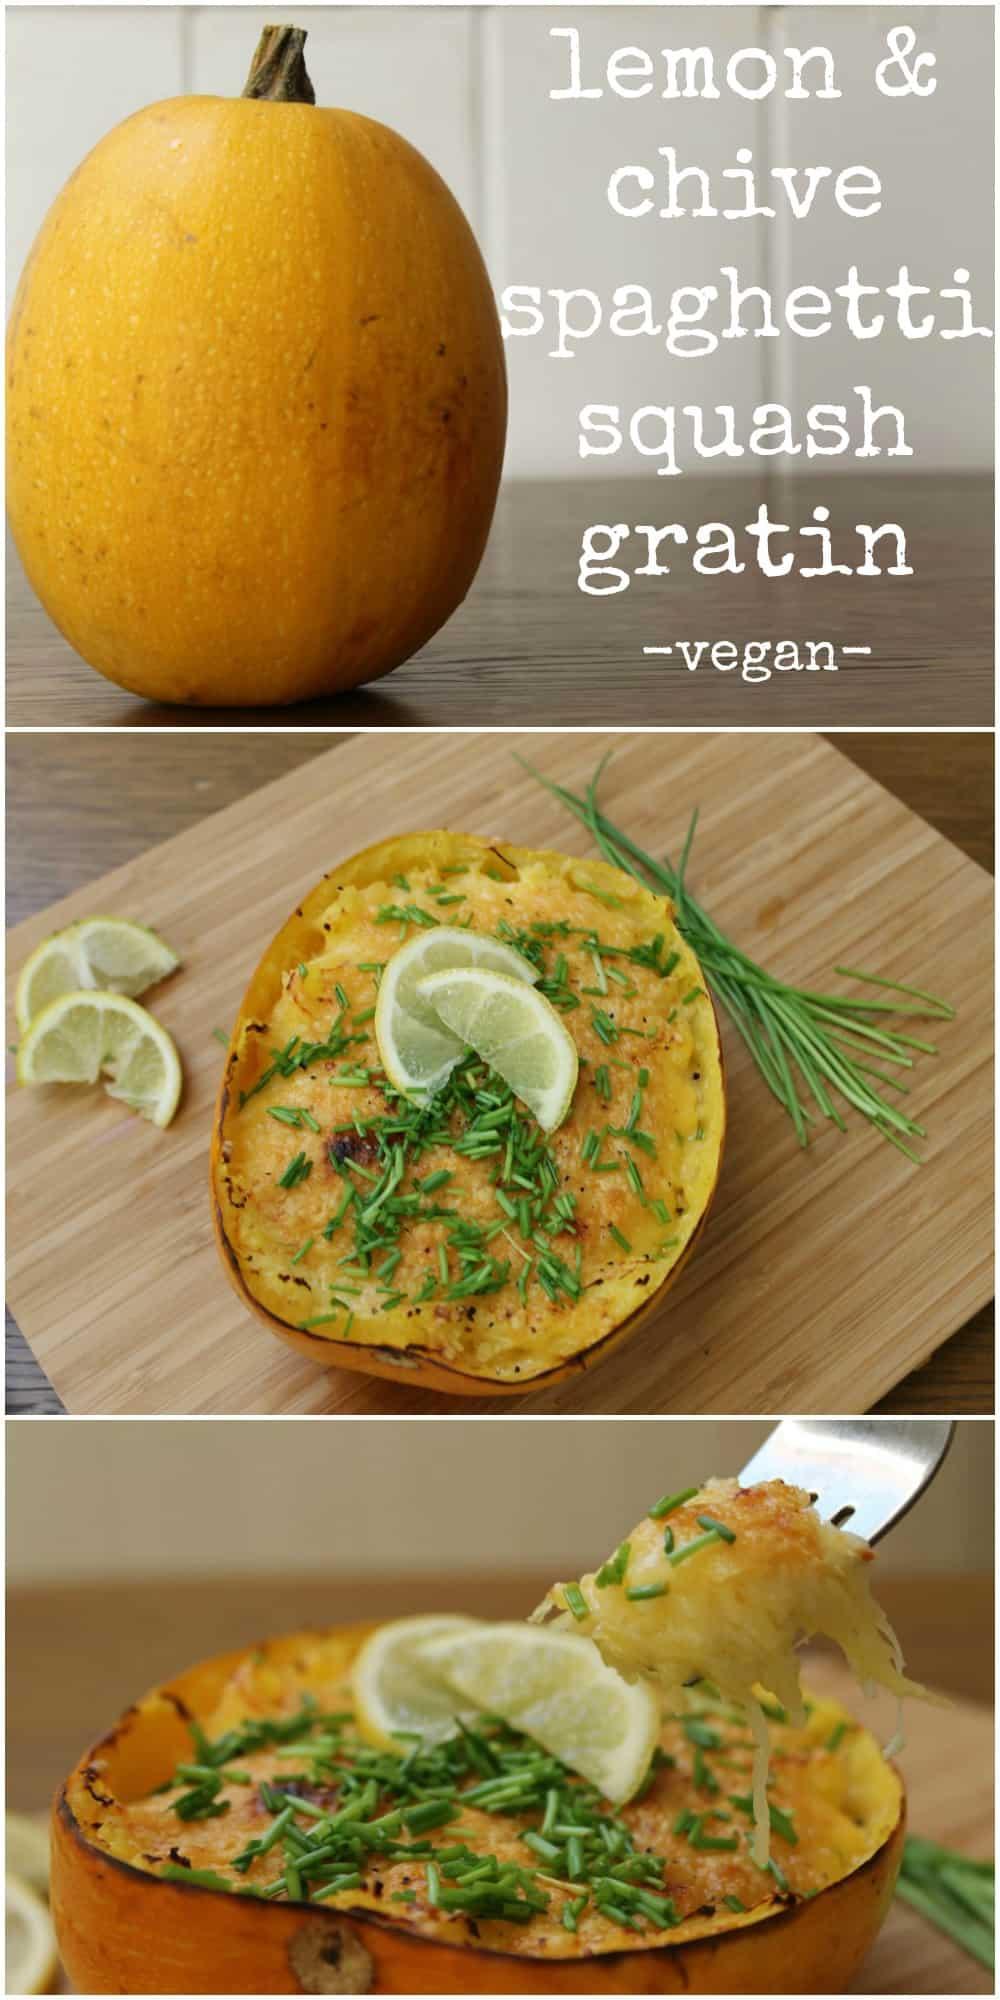 Lemon & Chive spaghetti squash gratin